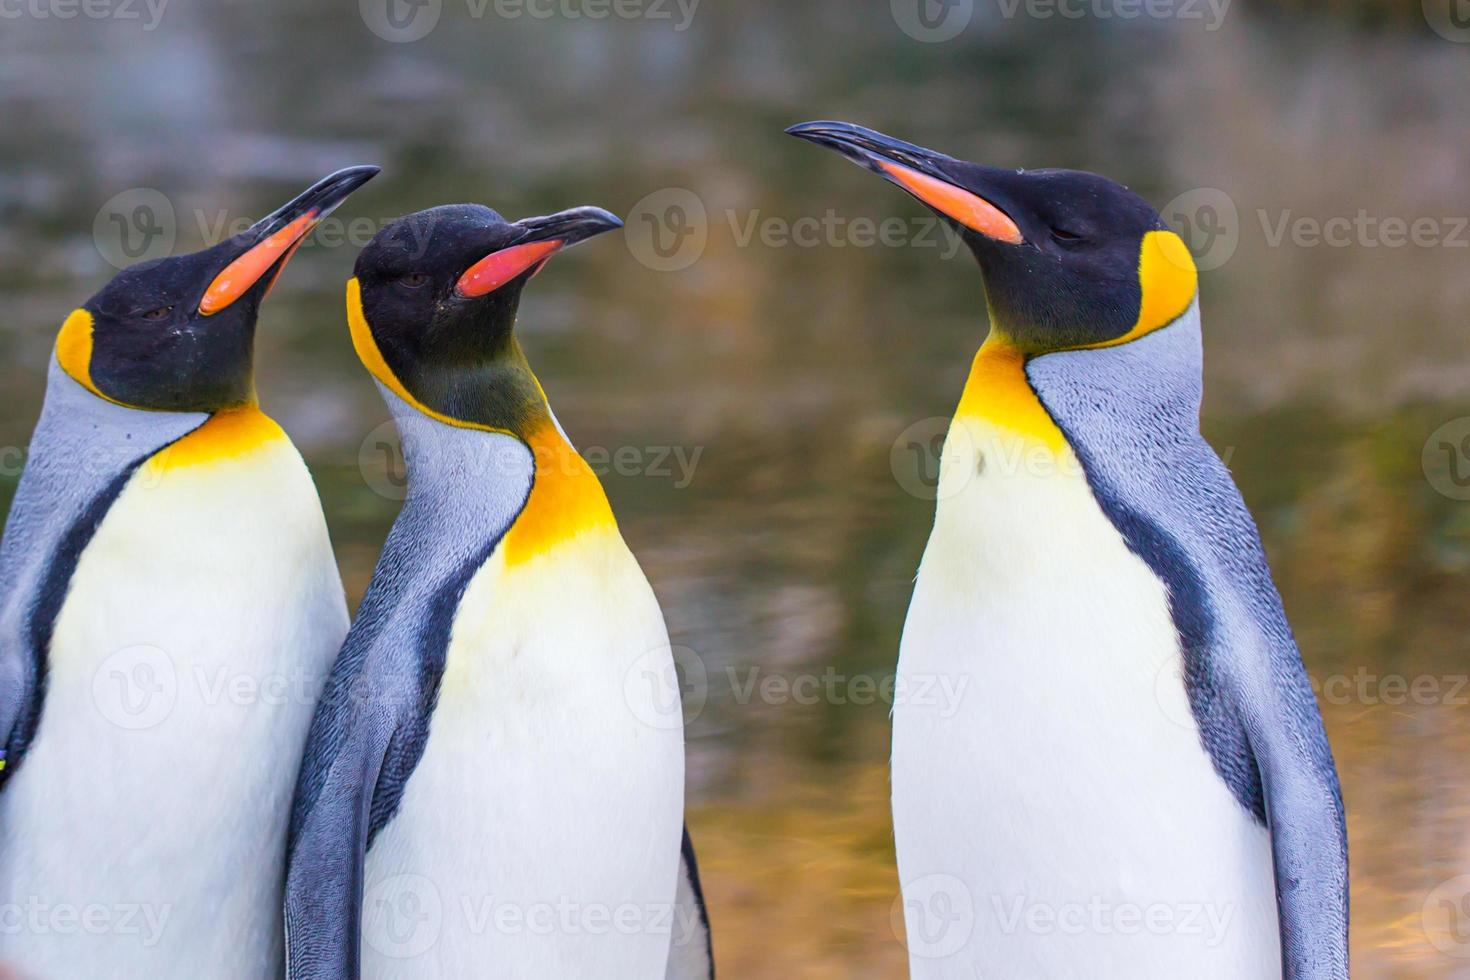 pinguins-imperador (aptenodytes forsteri) foto